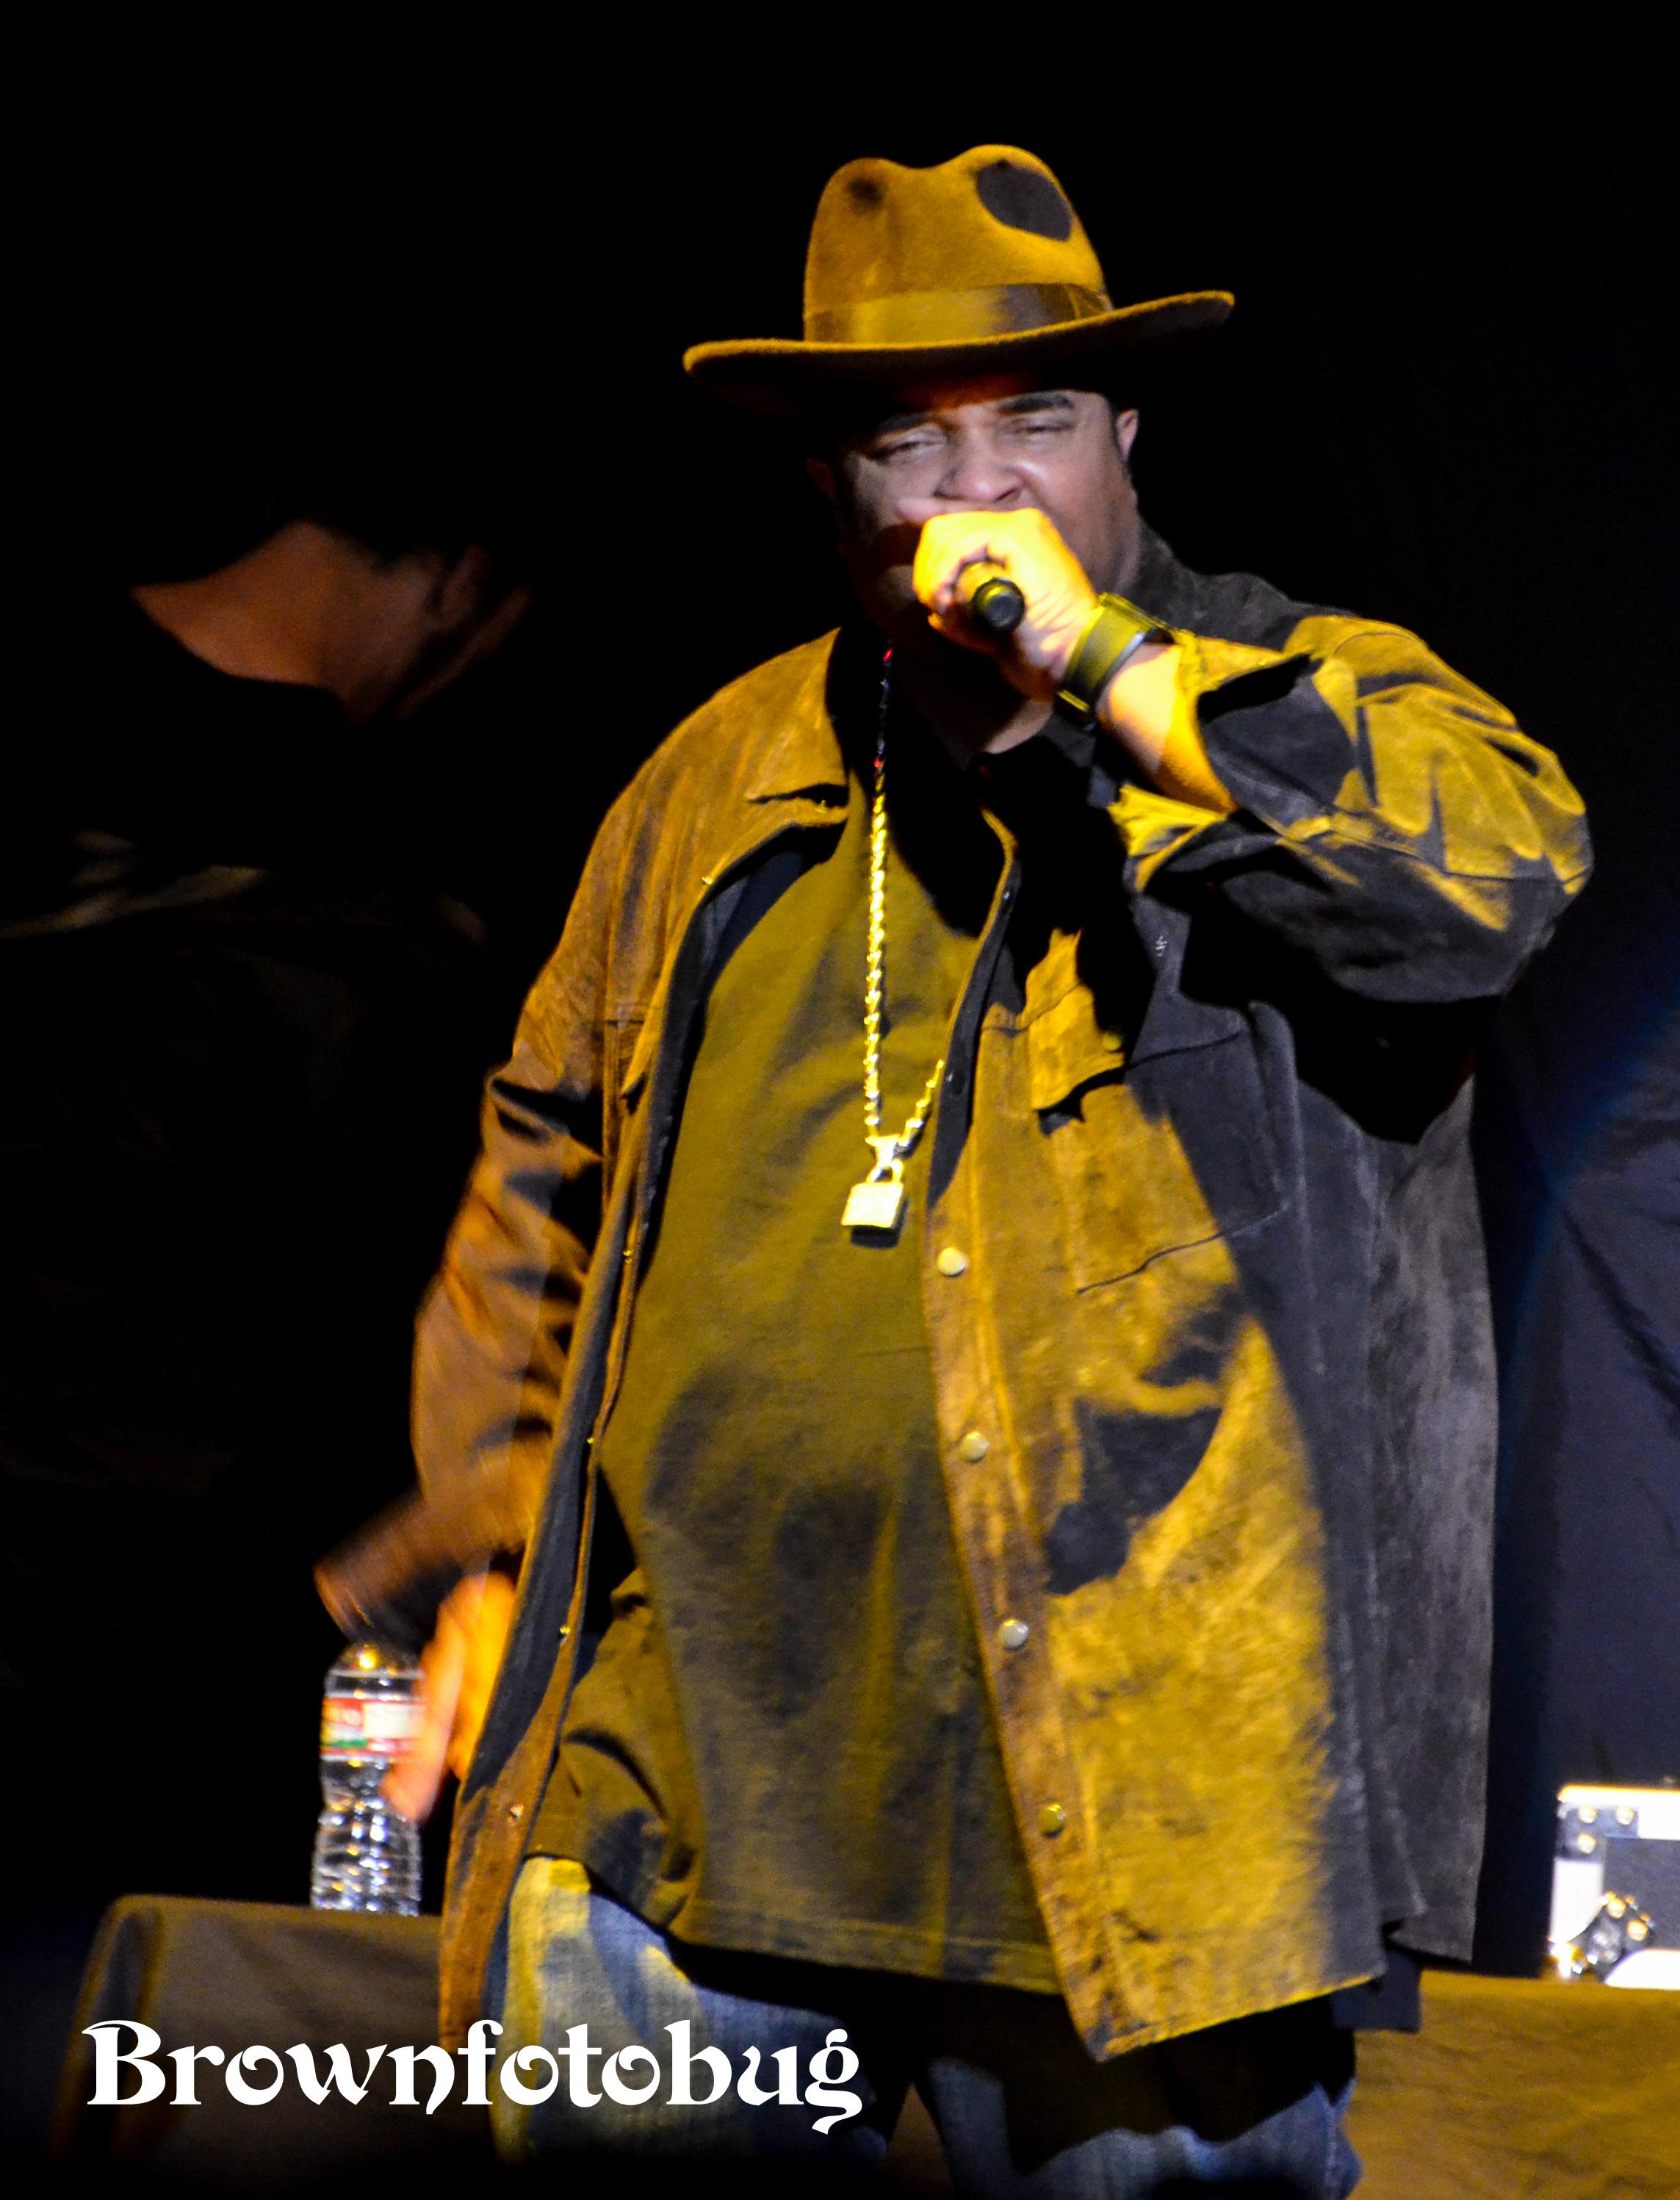 Macklemore & Ryan Lewis at Key Arena – 12/11/13 (Photo By Arlene Brown)